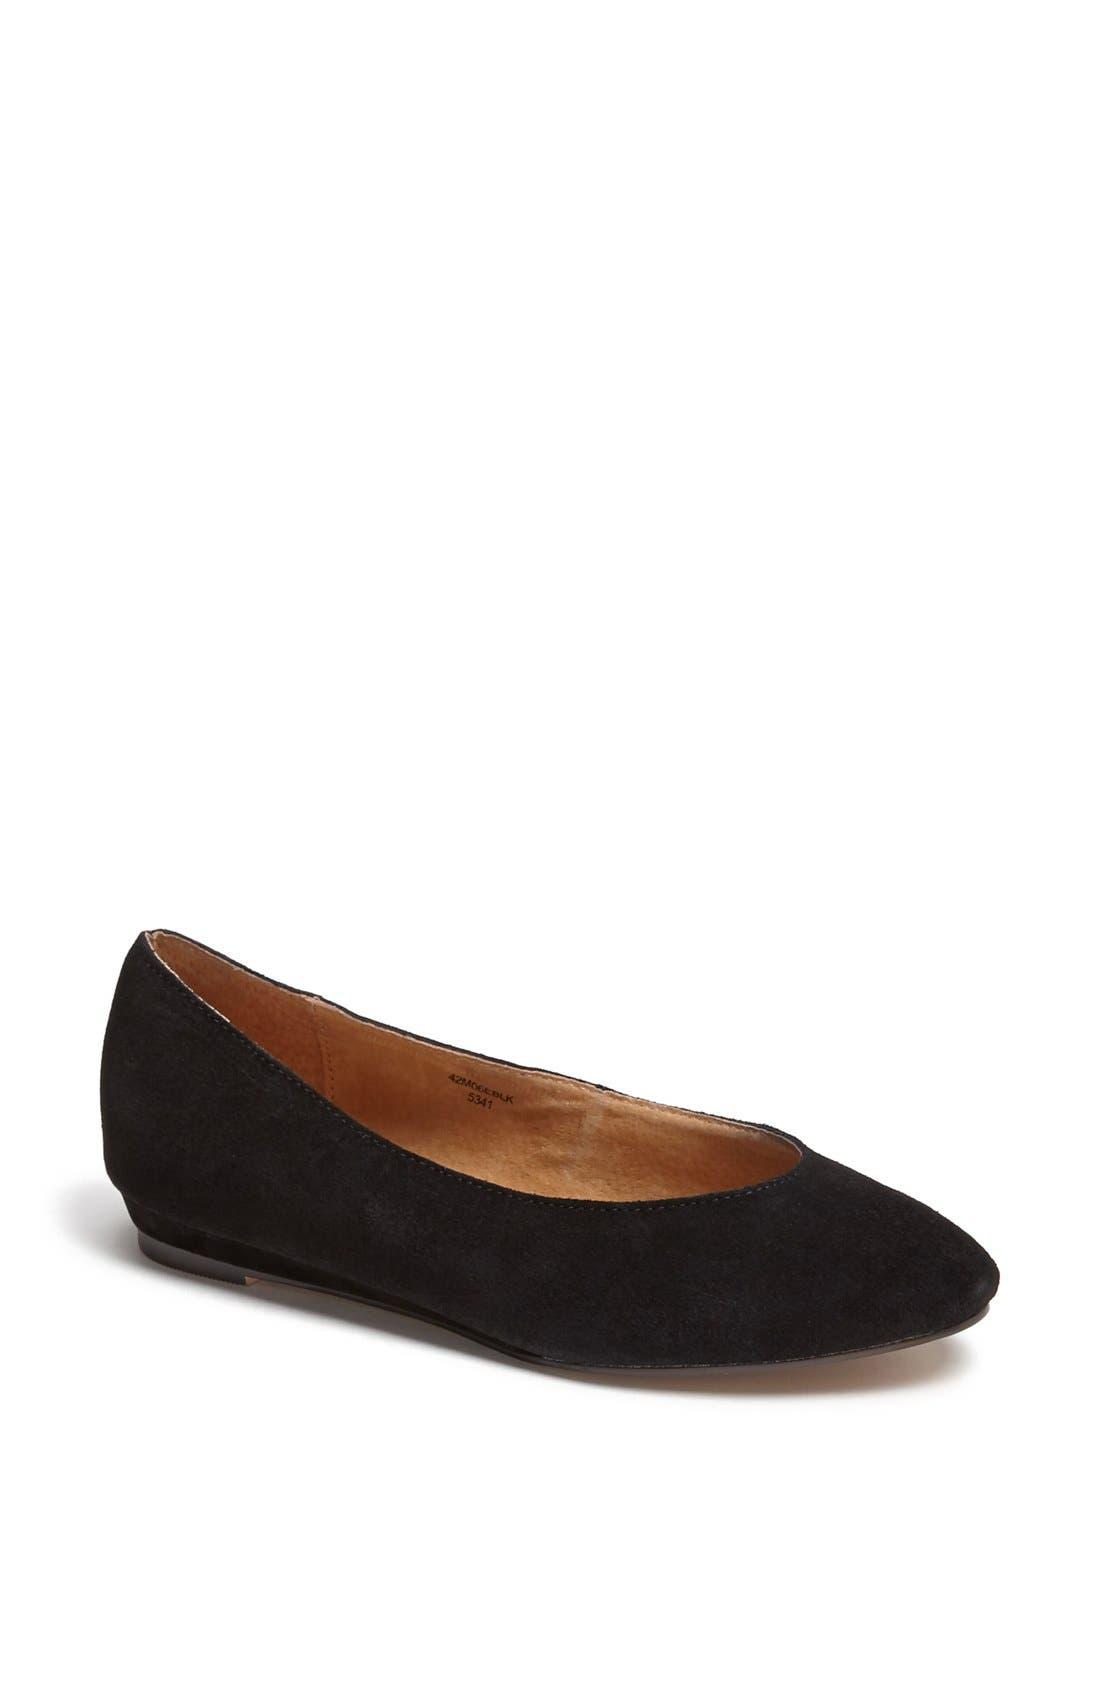 'Mello Mini Wedge' Court Shoe,                             Main thumbnail 1, color,                             001